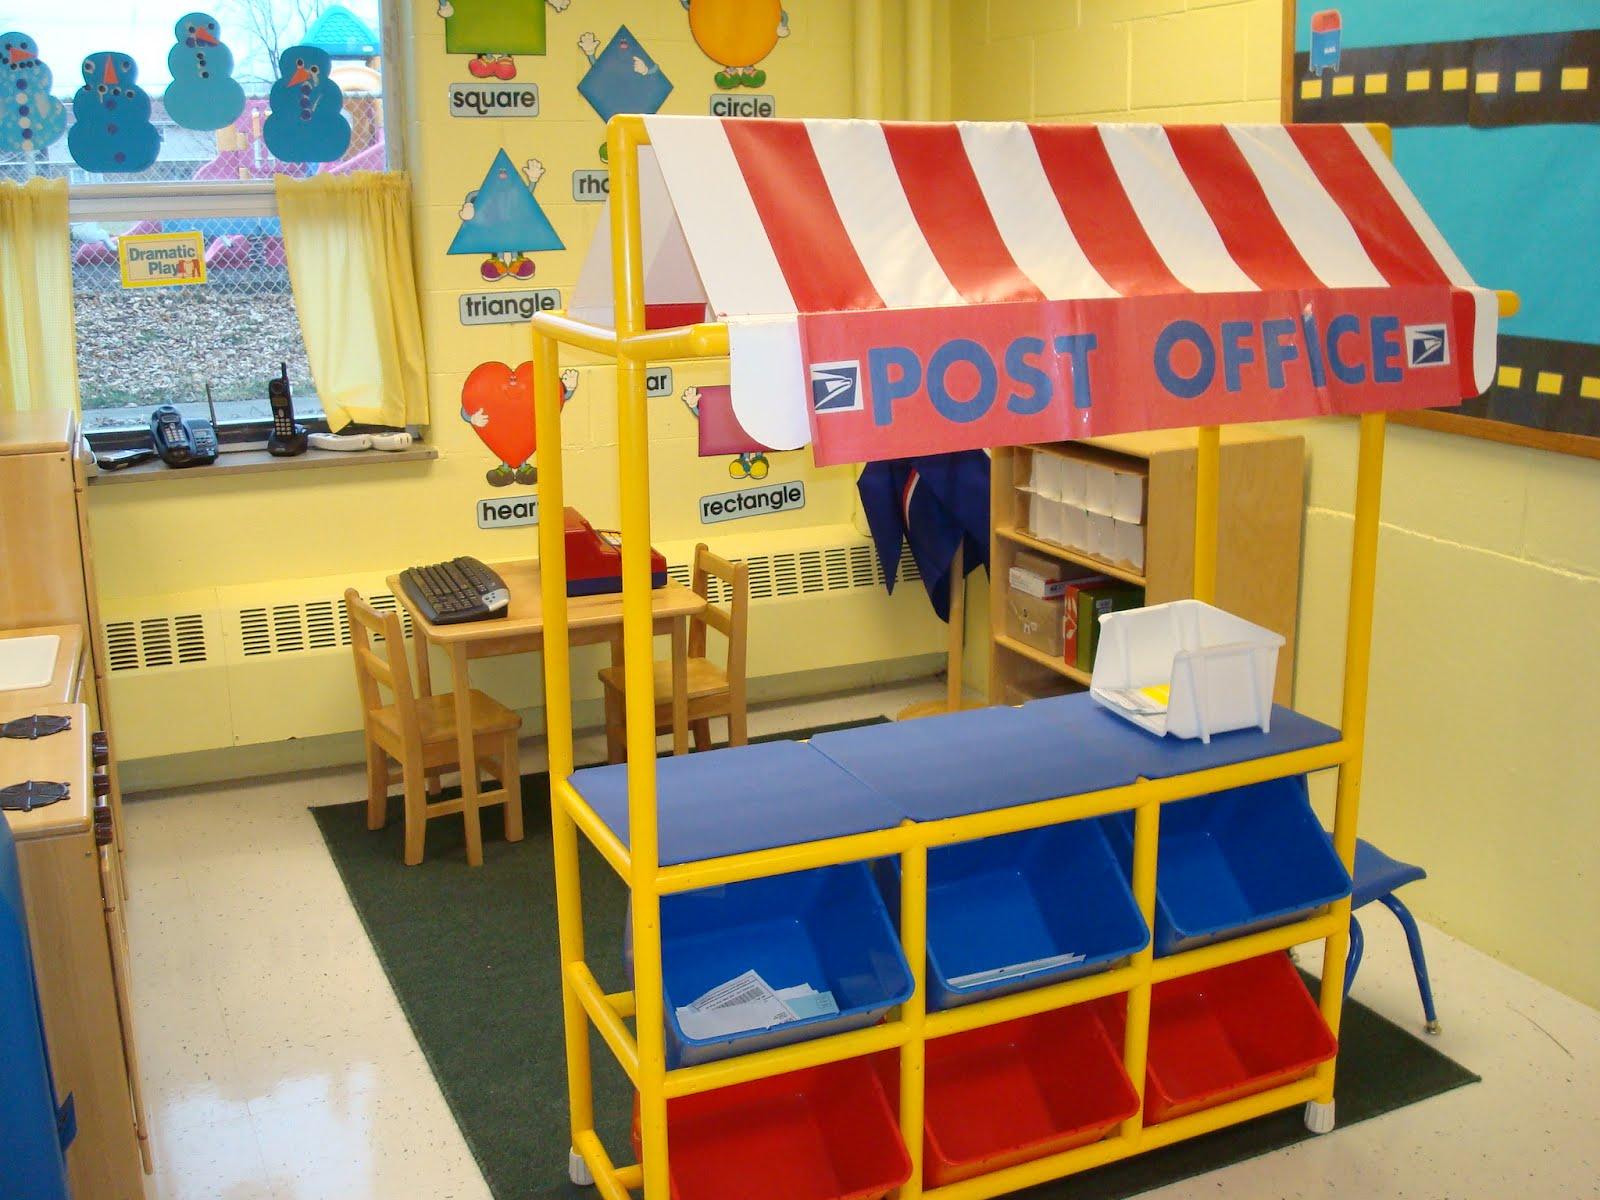 Trinity Preschool Mount Prospect: February 2012